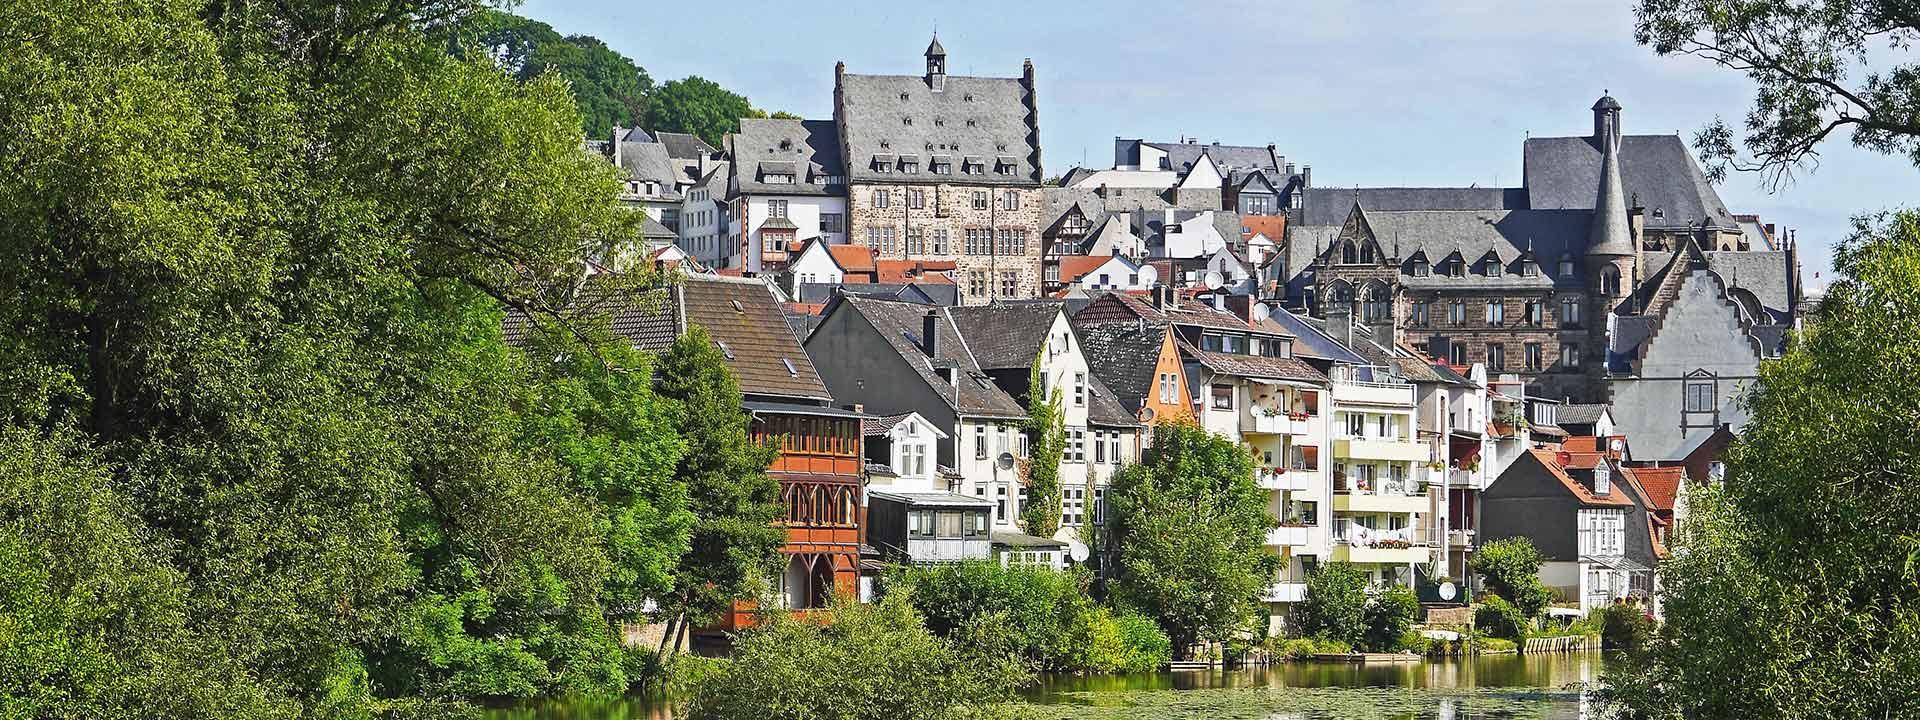 Stadt Marburg fördert Dachbegrünungen